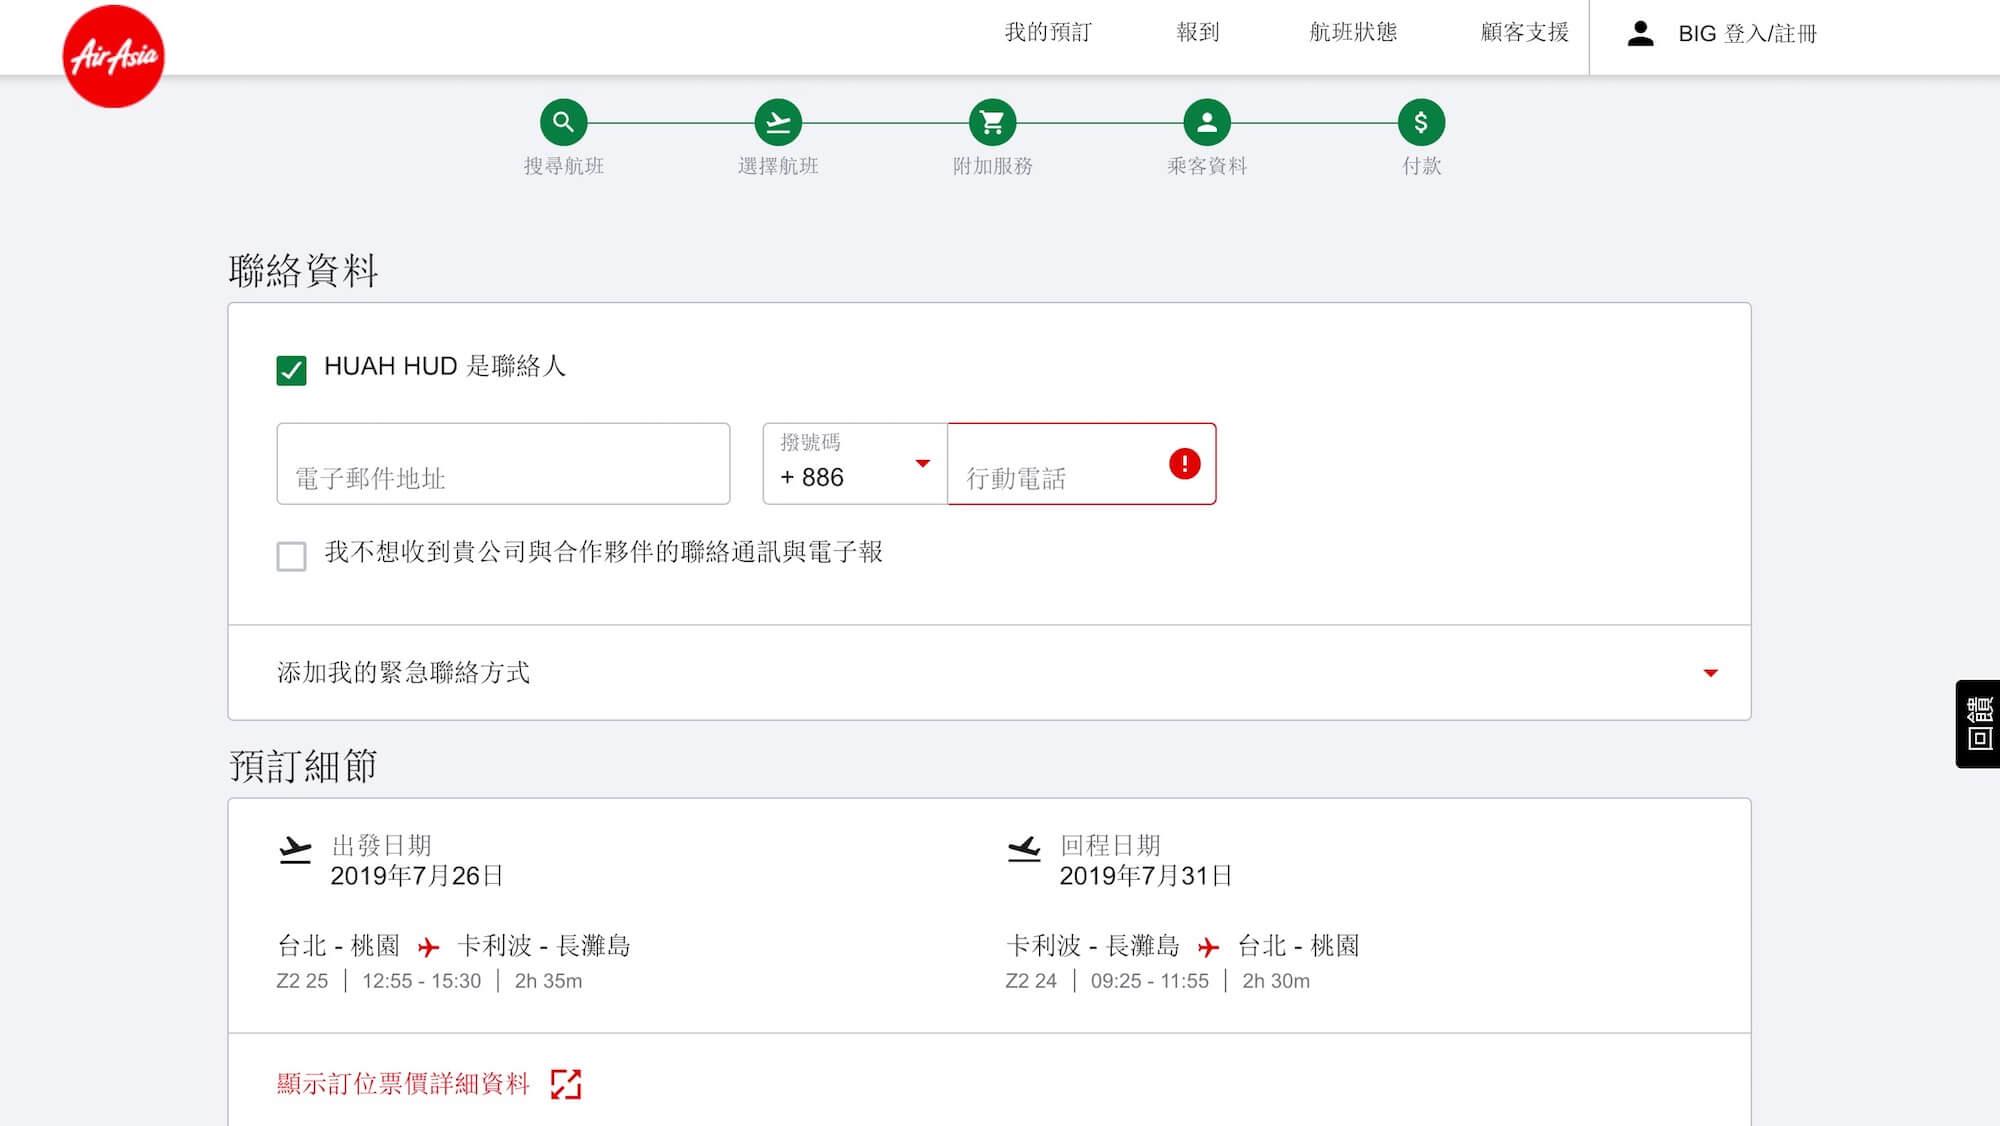 AirAsia購票長灘島結帳付款